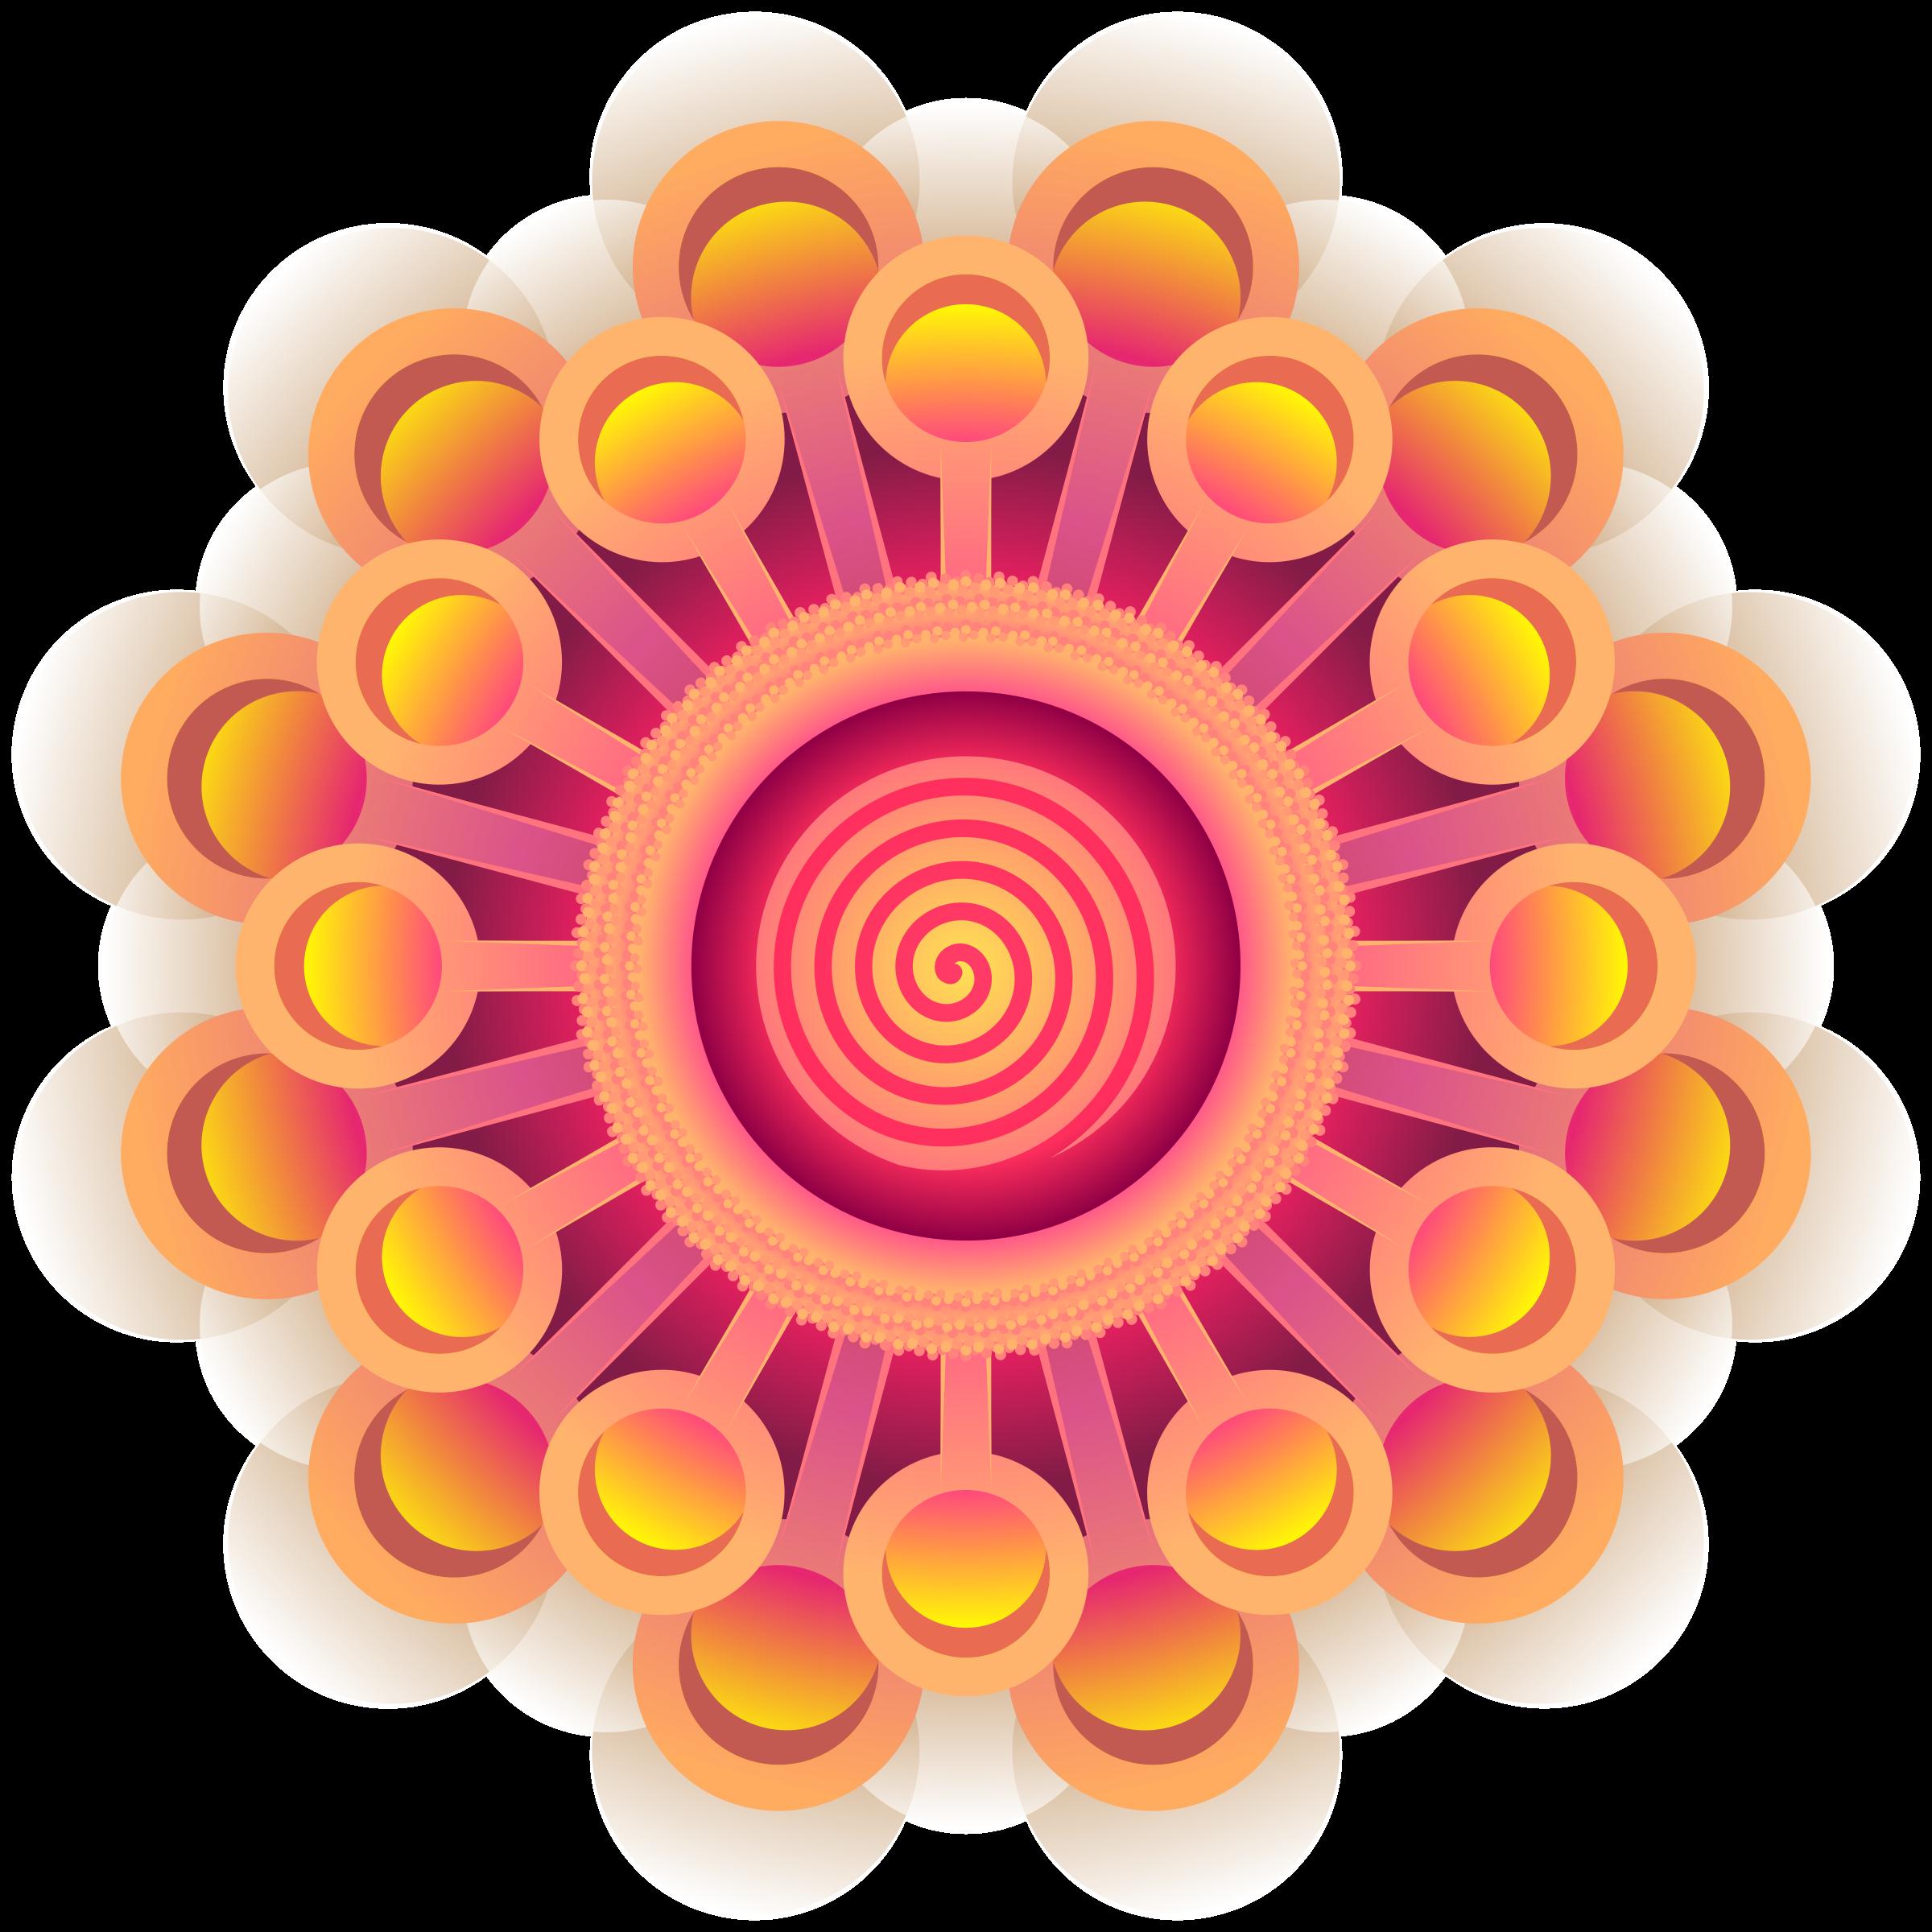 Elements png image arts. Design clipart orange